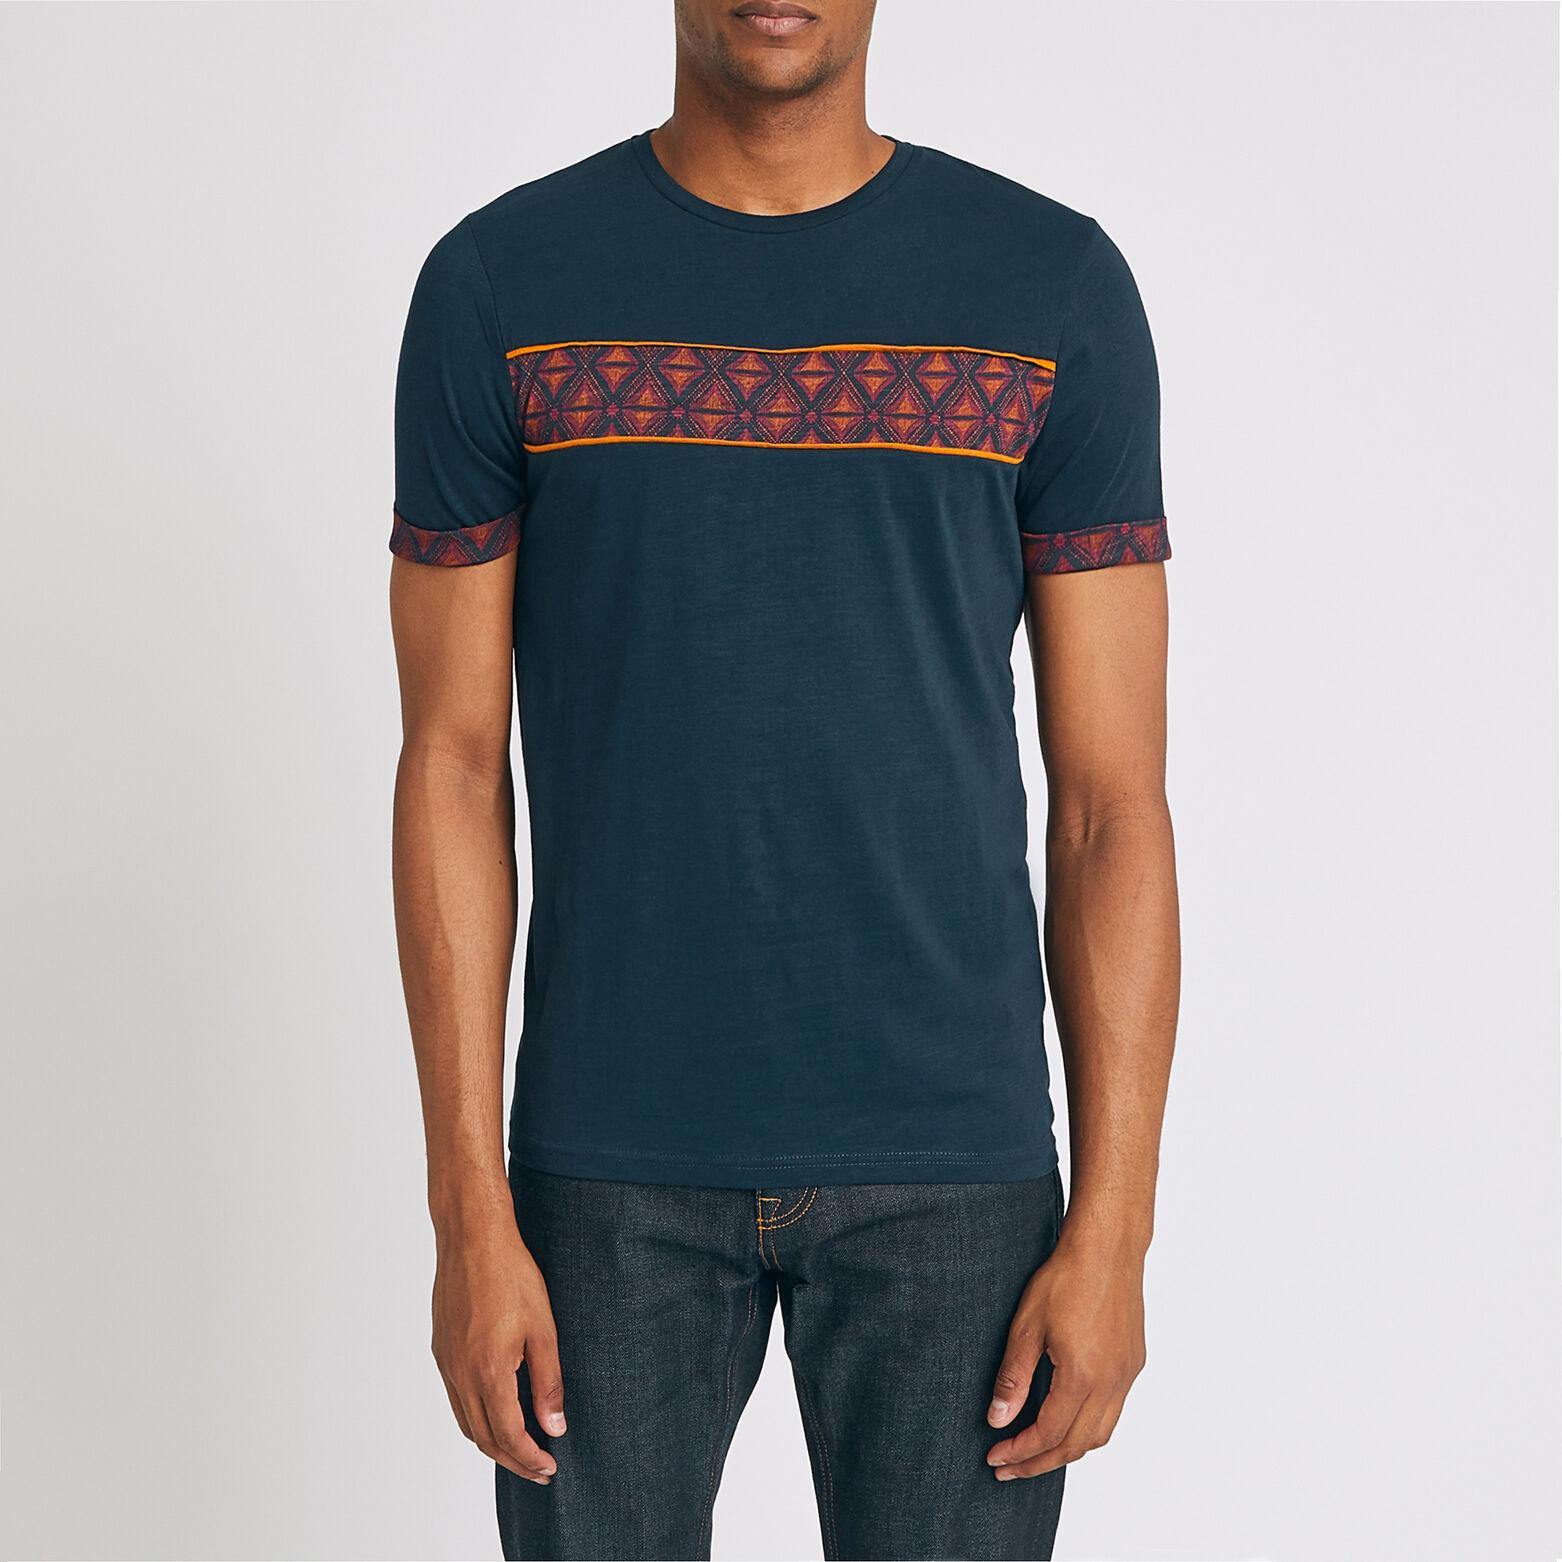 Tee shirt bande imprimé ethnique